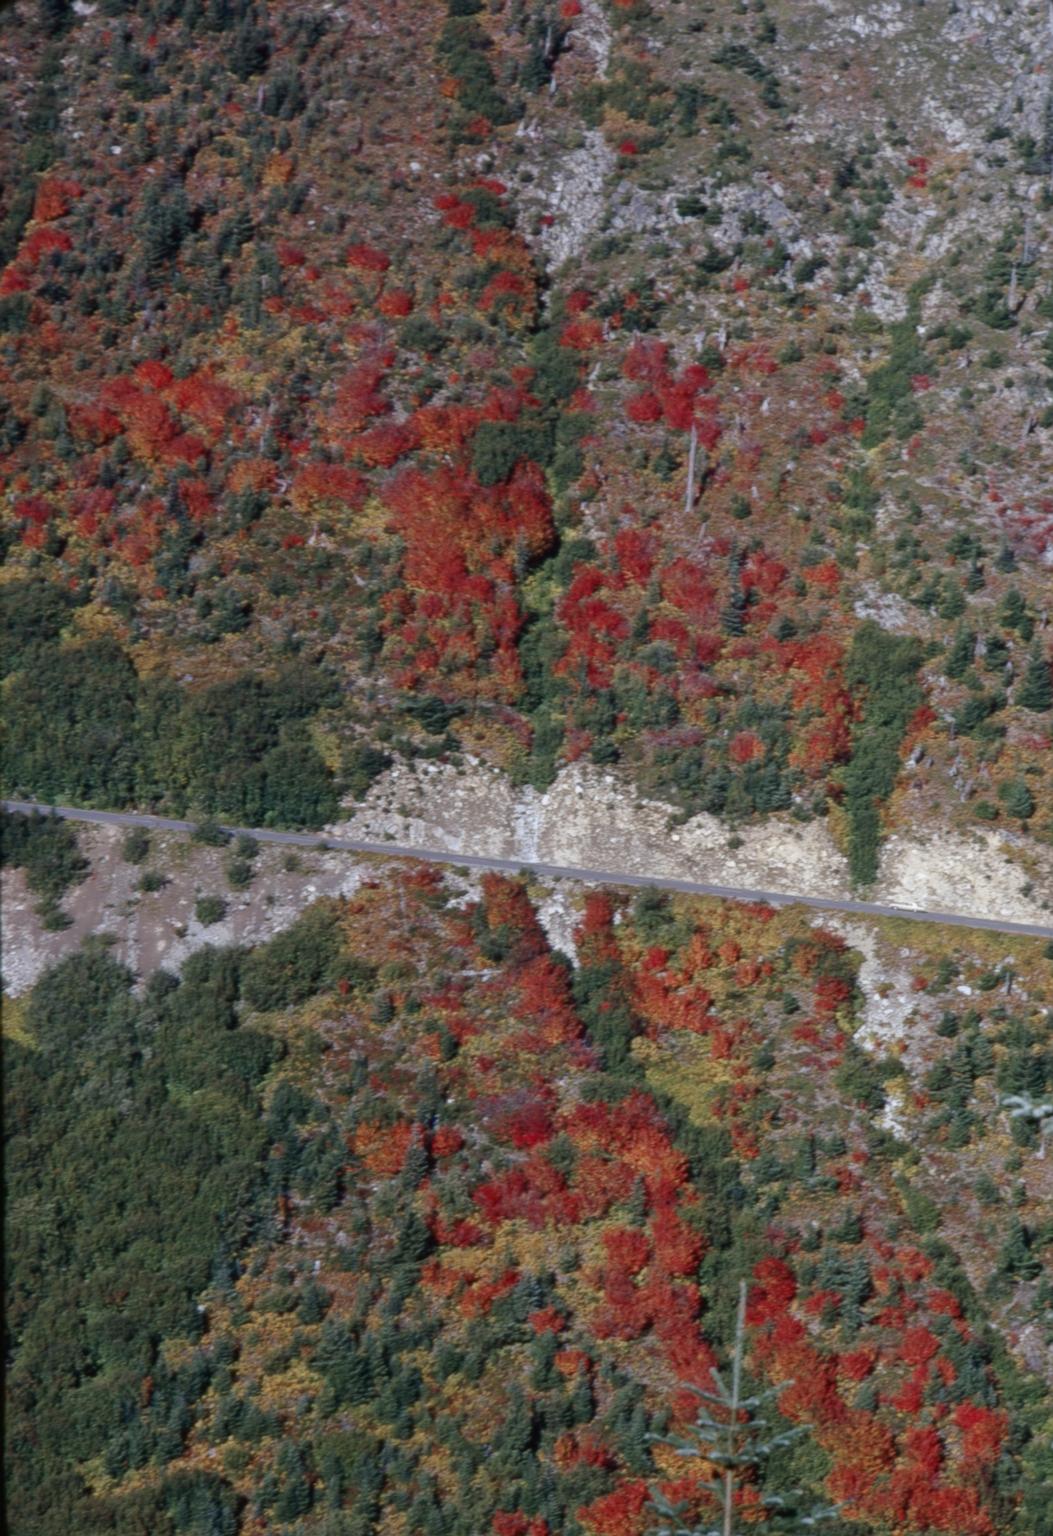 Fall foliage in Mount Rainier National Park